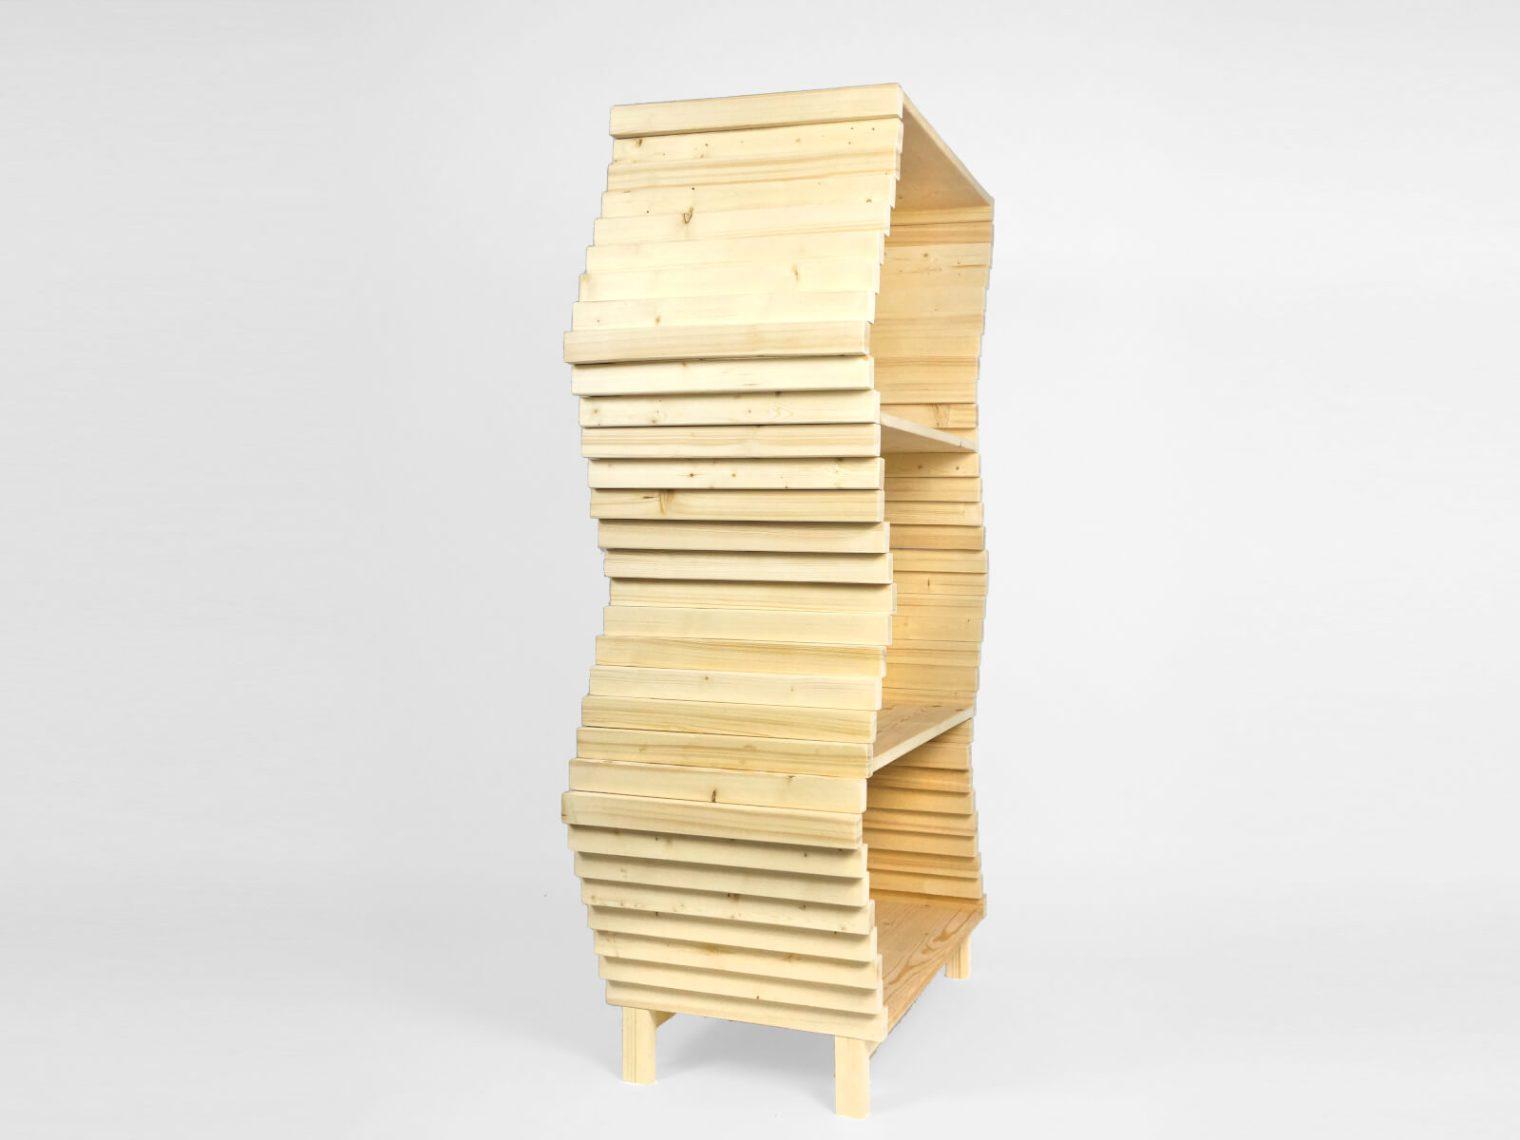 customizable-wood-shelf-bookshelf05.jpg